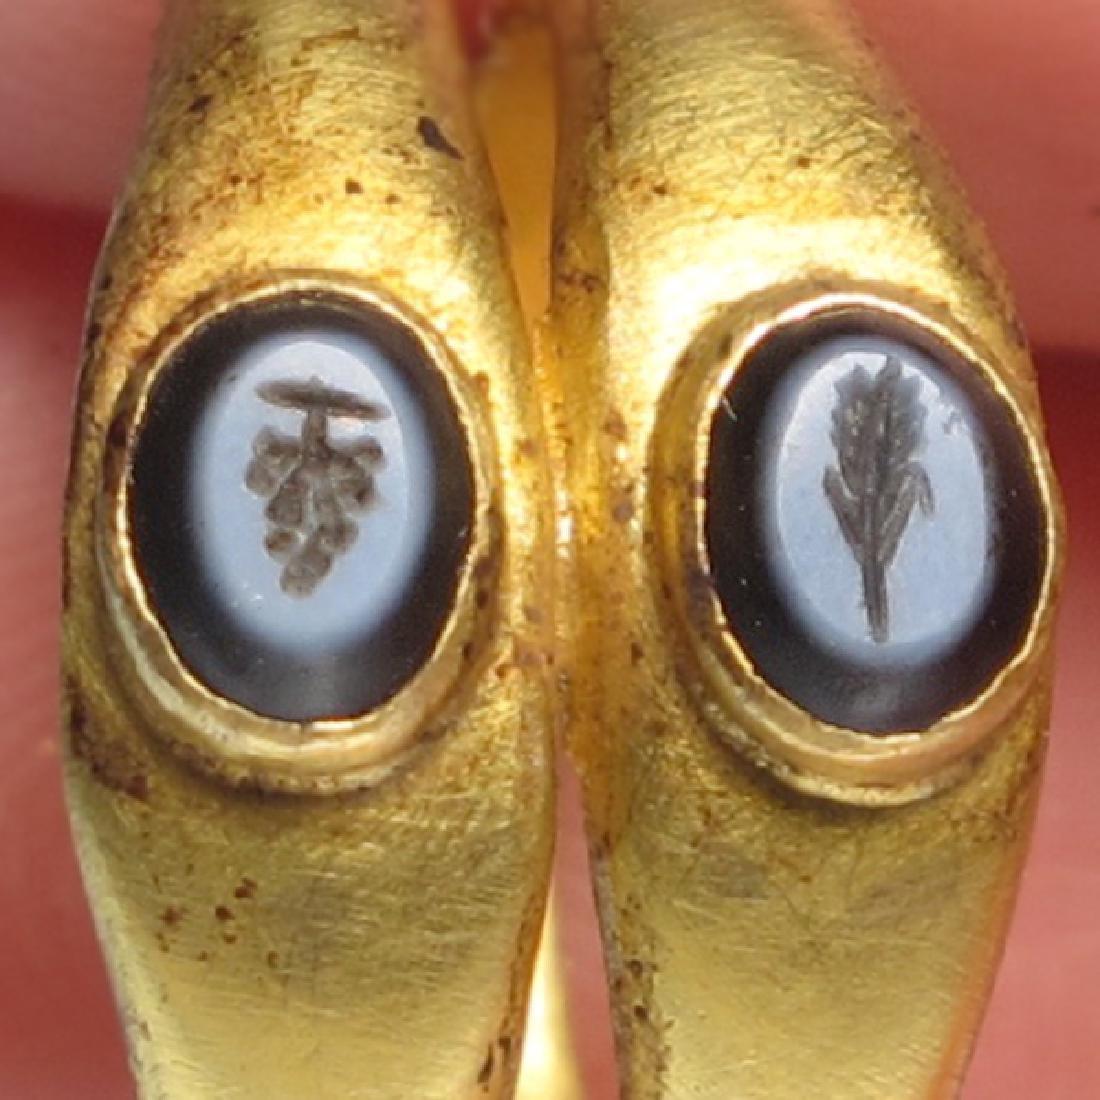 Roman Gold Double Ring, Onyx Intaglios, c. 2nd Century - 3